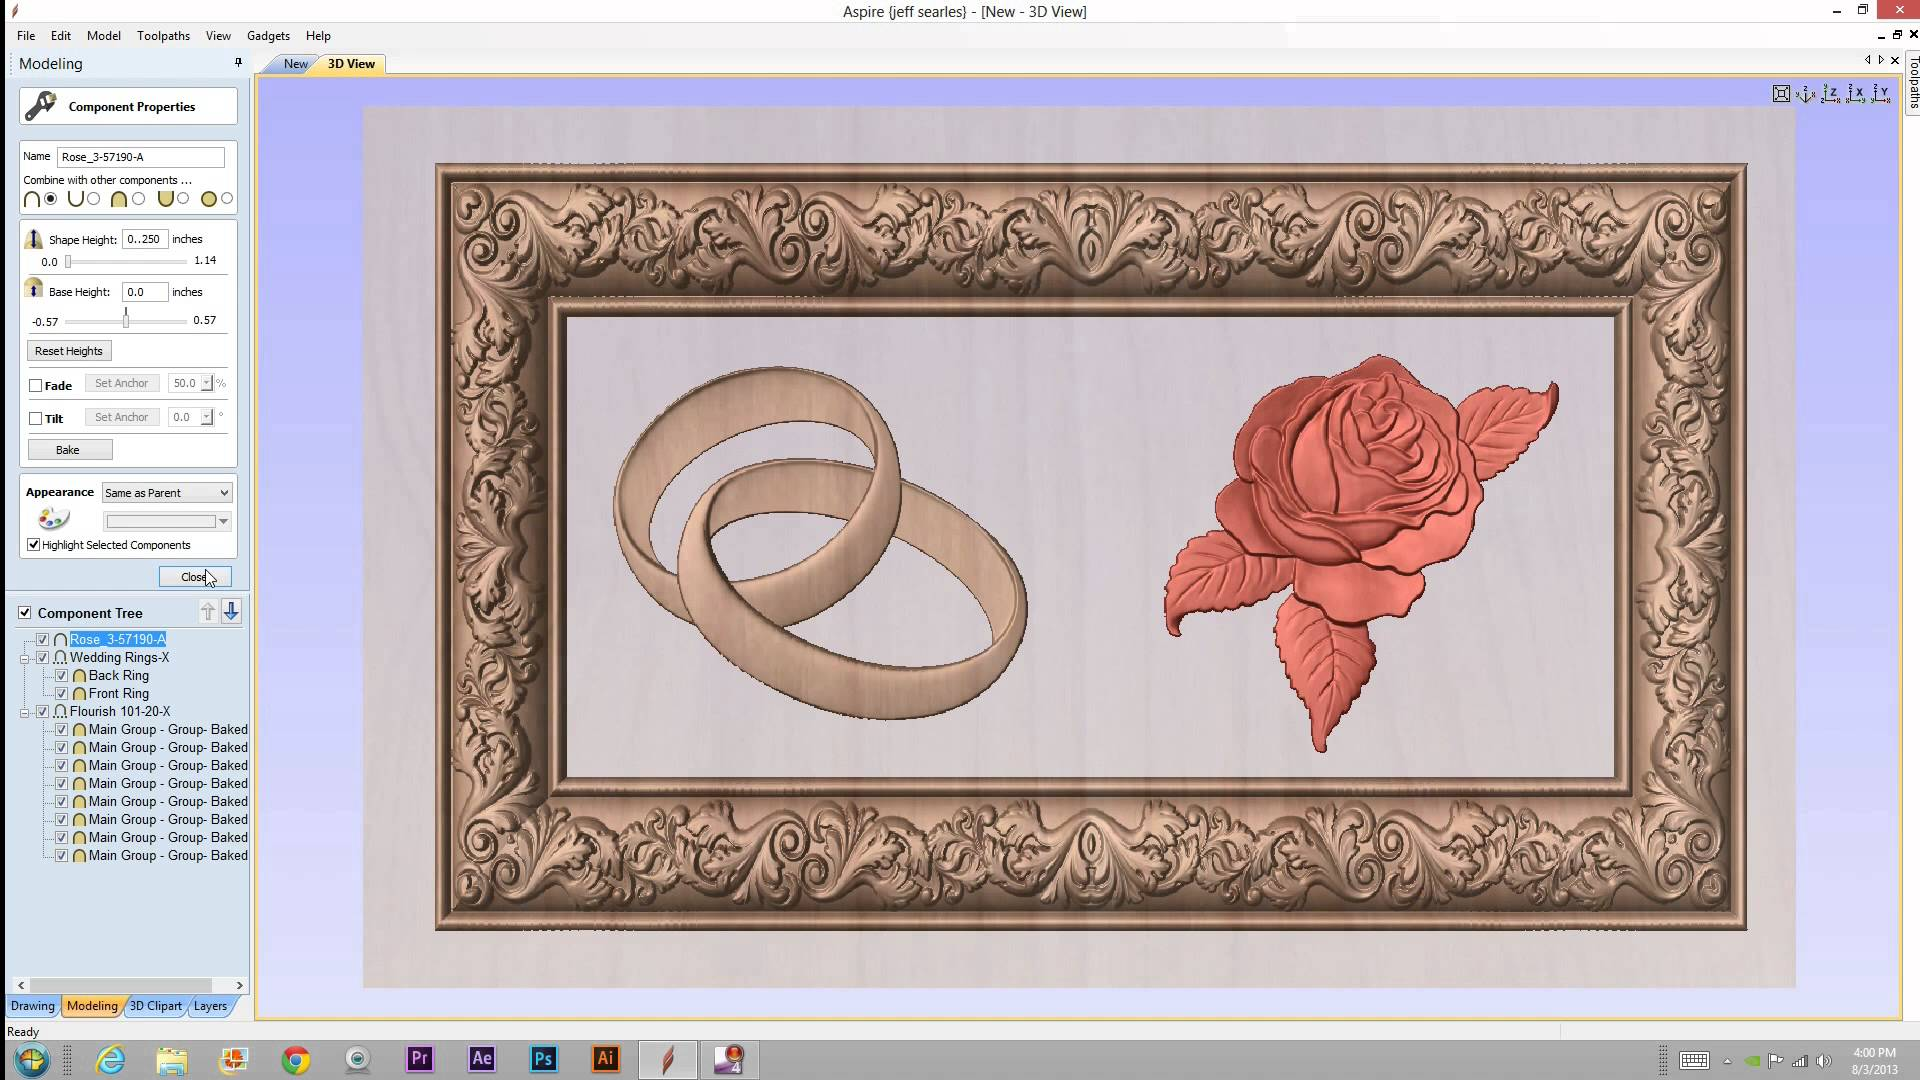 Aspire picture or screenshot